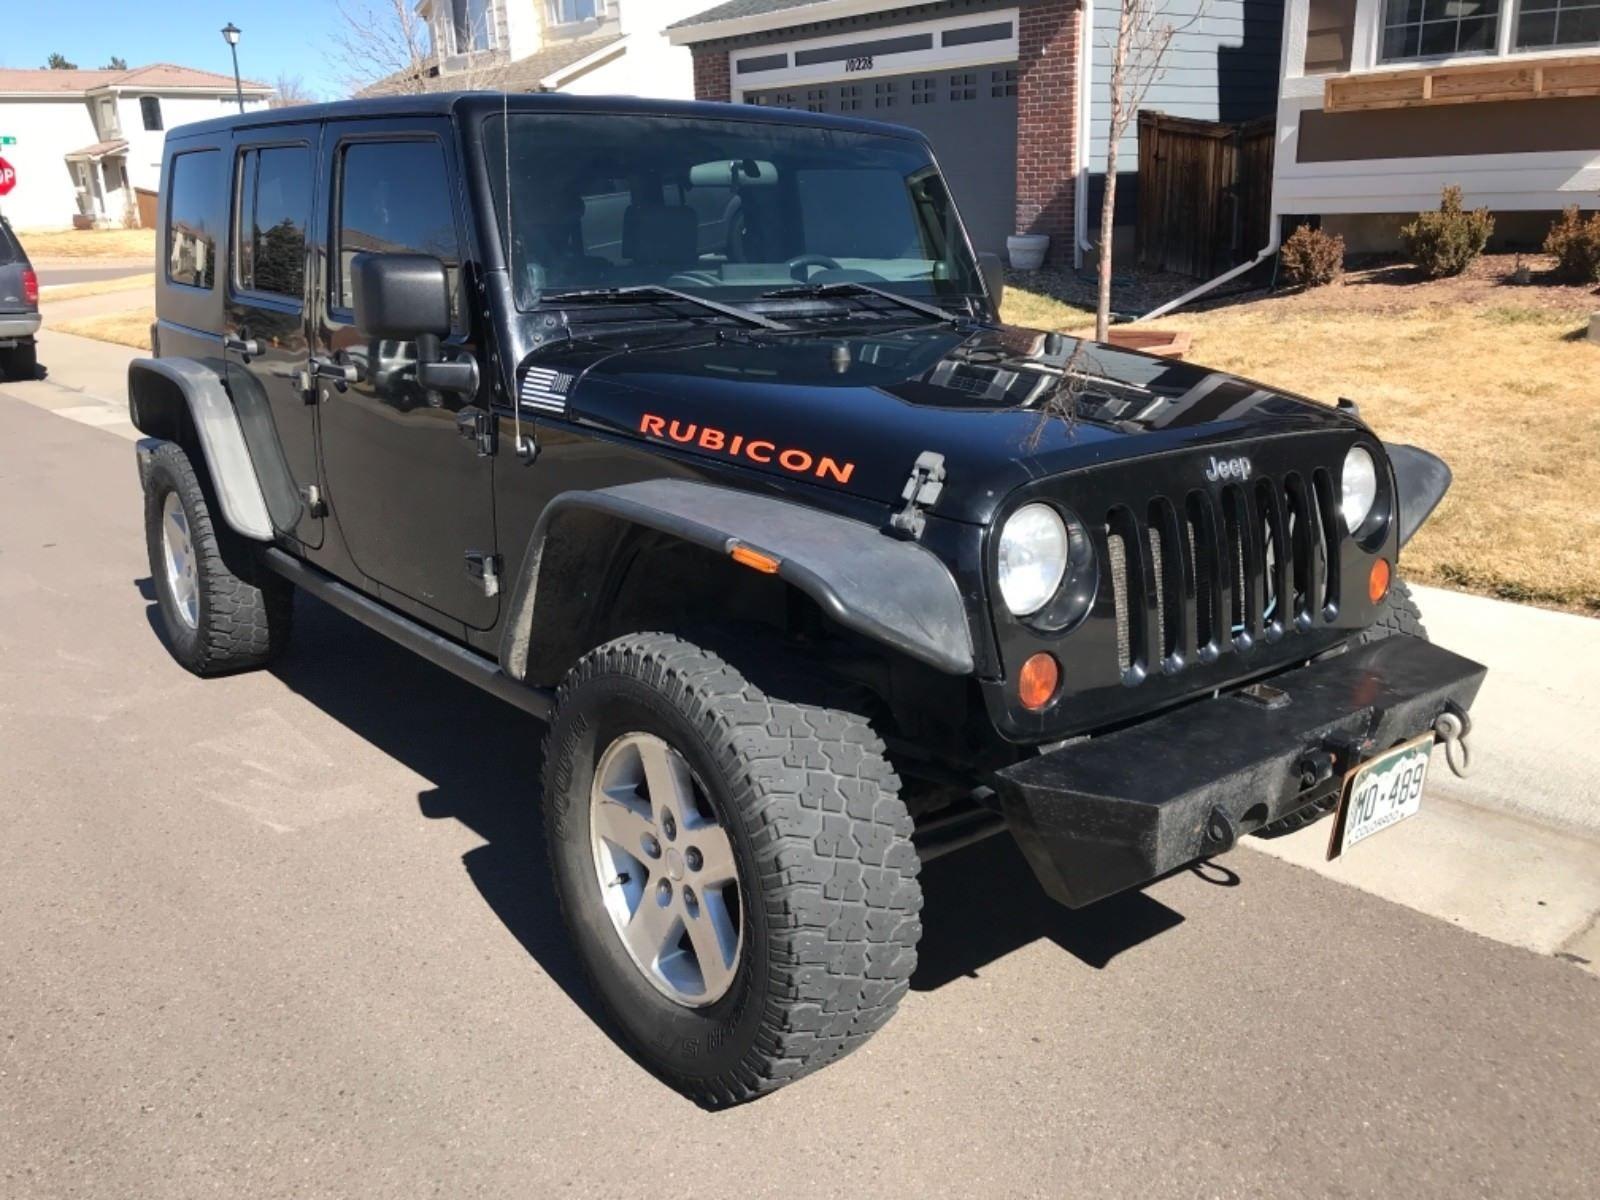 ebay 2008 jeep wrangler rubicon 2008 jeep wrangler unlimited rh pinterest com 2014 Jeep Wrangler Rubicon 4 Door Jeep Wrangler Rubicon